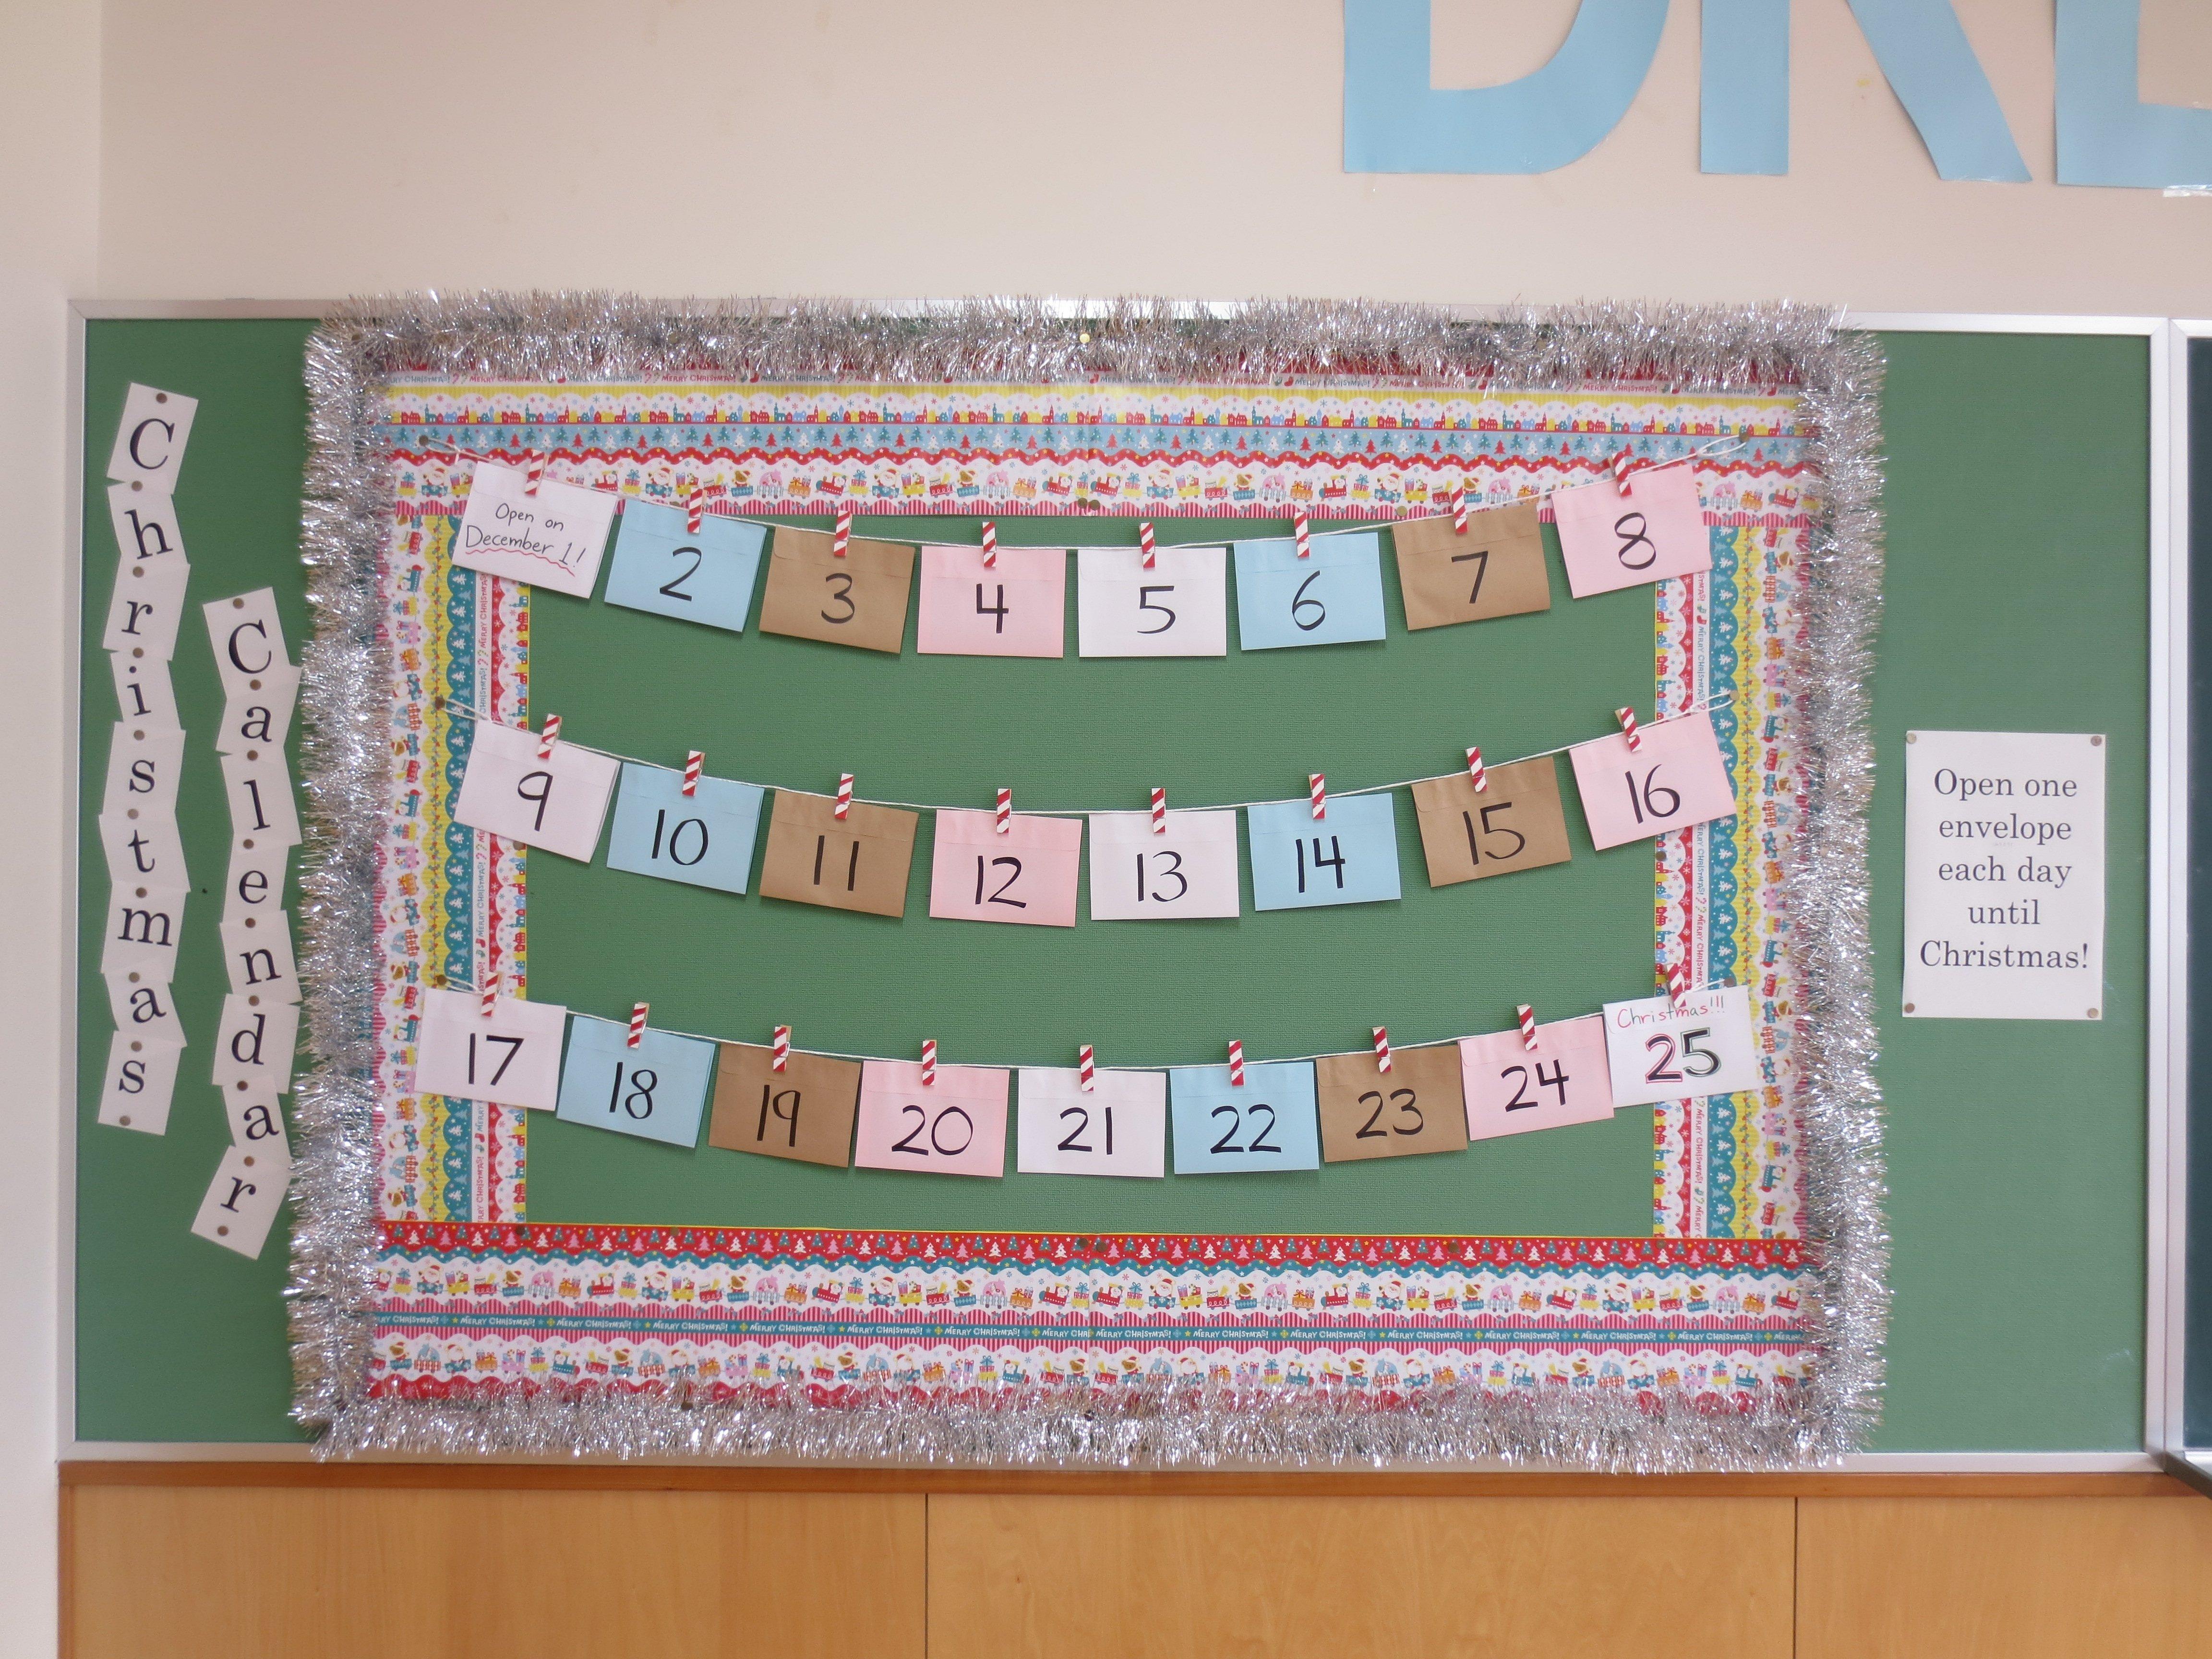 10 Cute Bulletin Board Ideas For Middle School simple english bulletin board ideas e7b4a0e695b5e381aae383a9e382a4e38395 2020